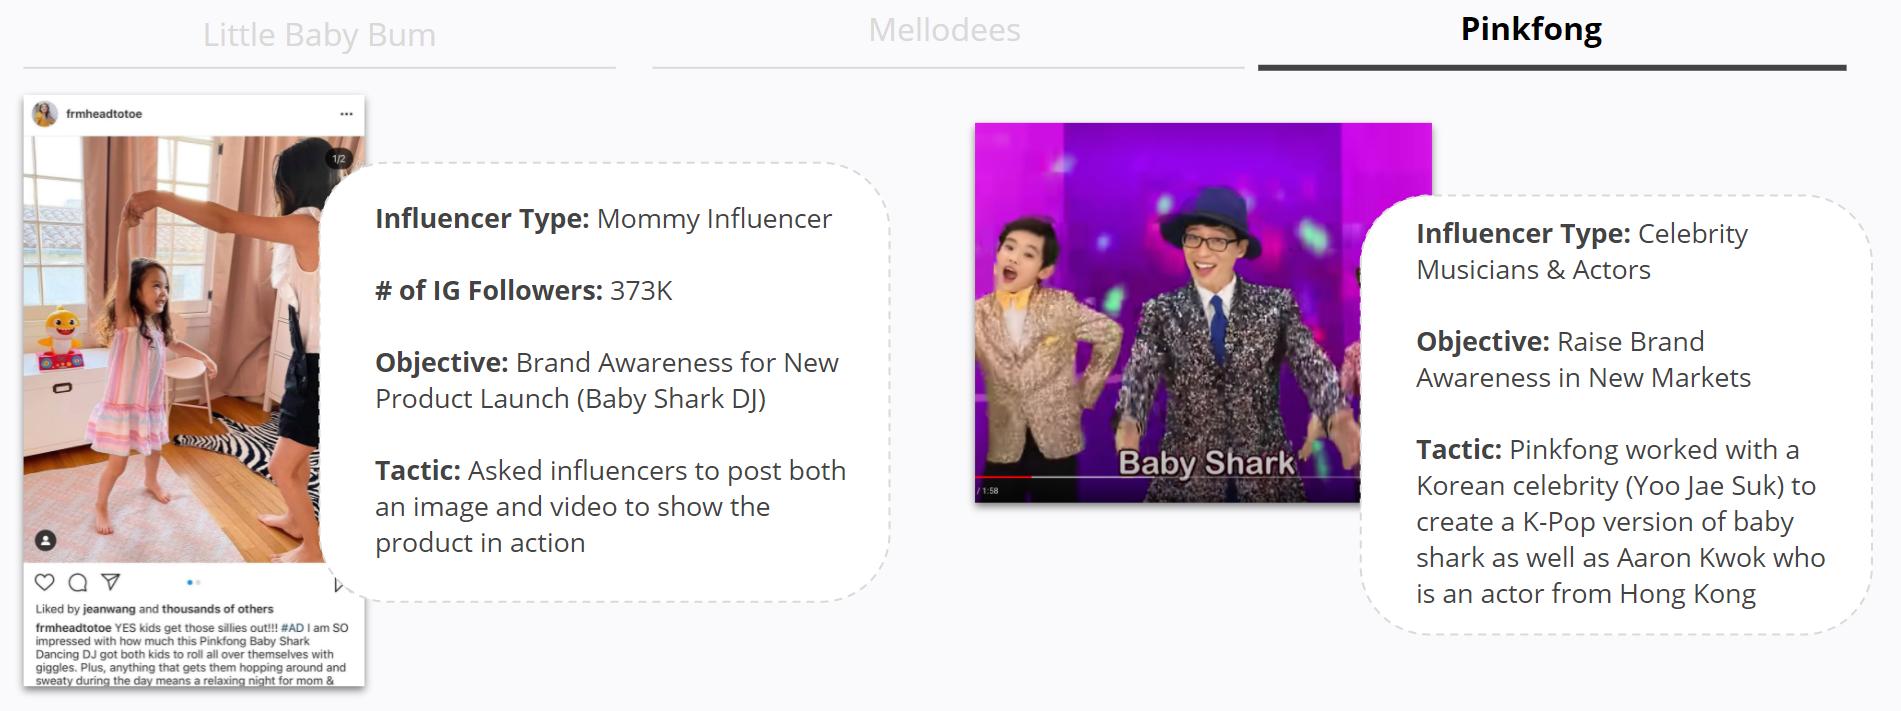 Pinkfong - Celebrity Musicians